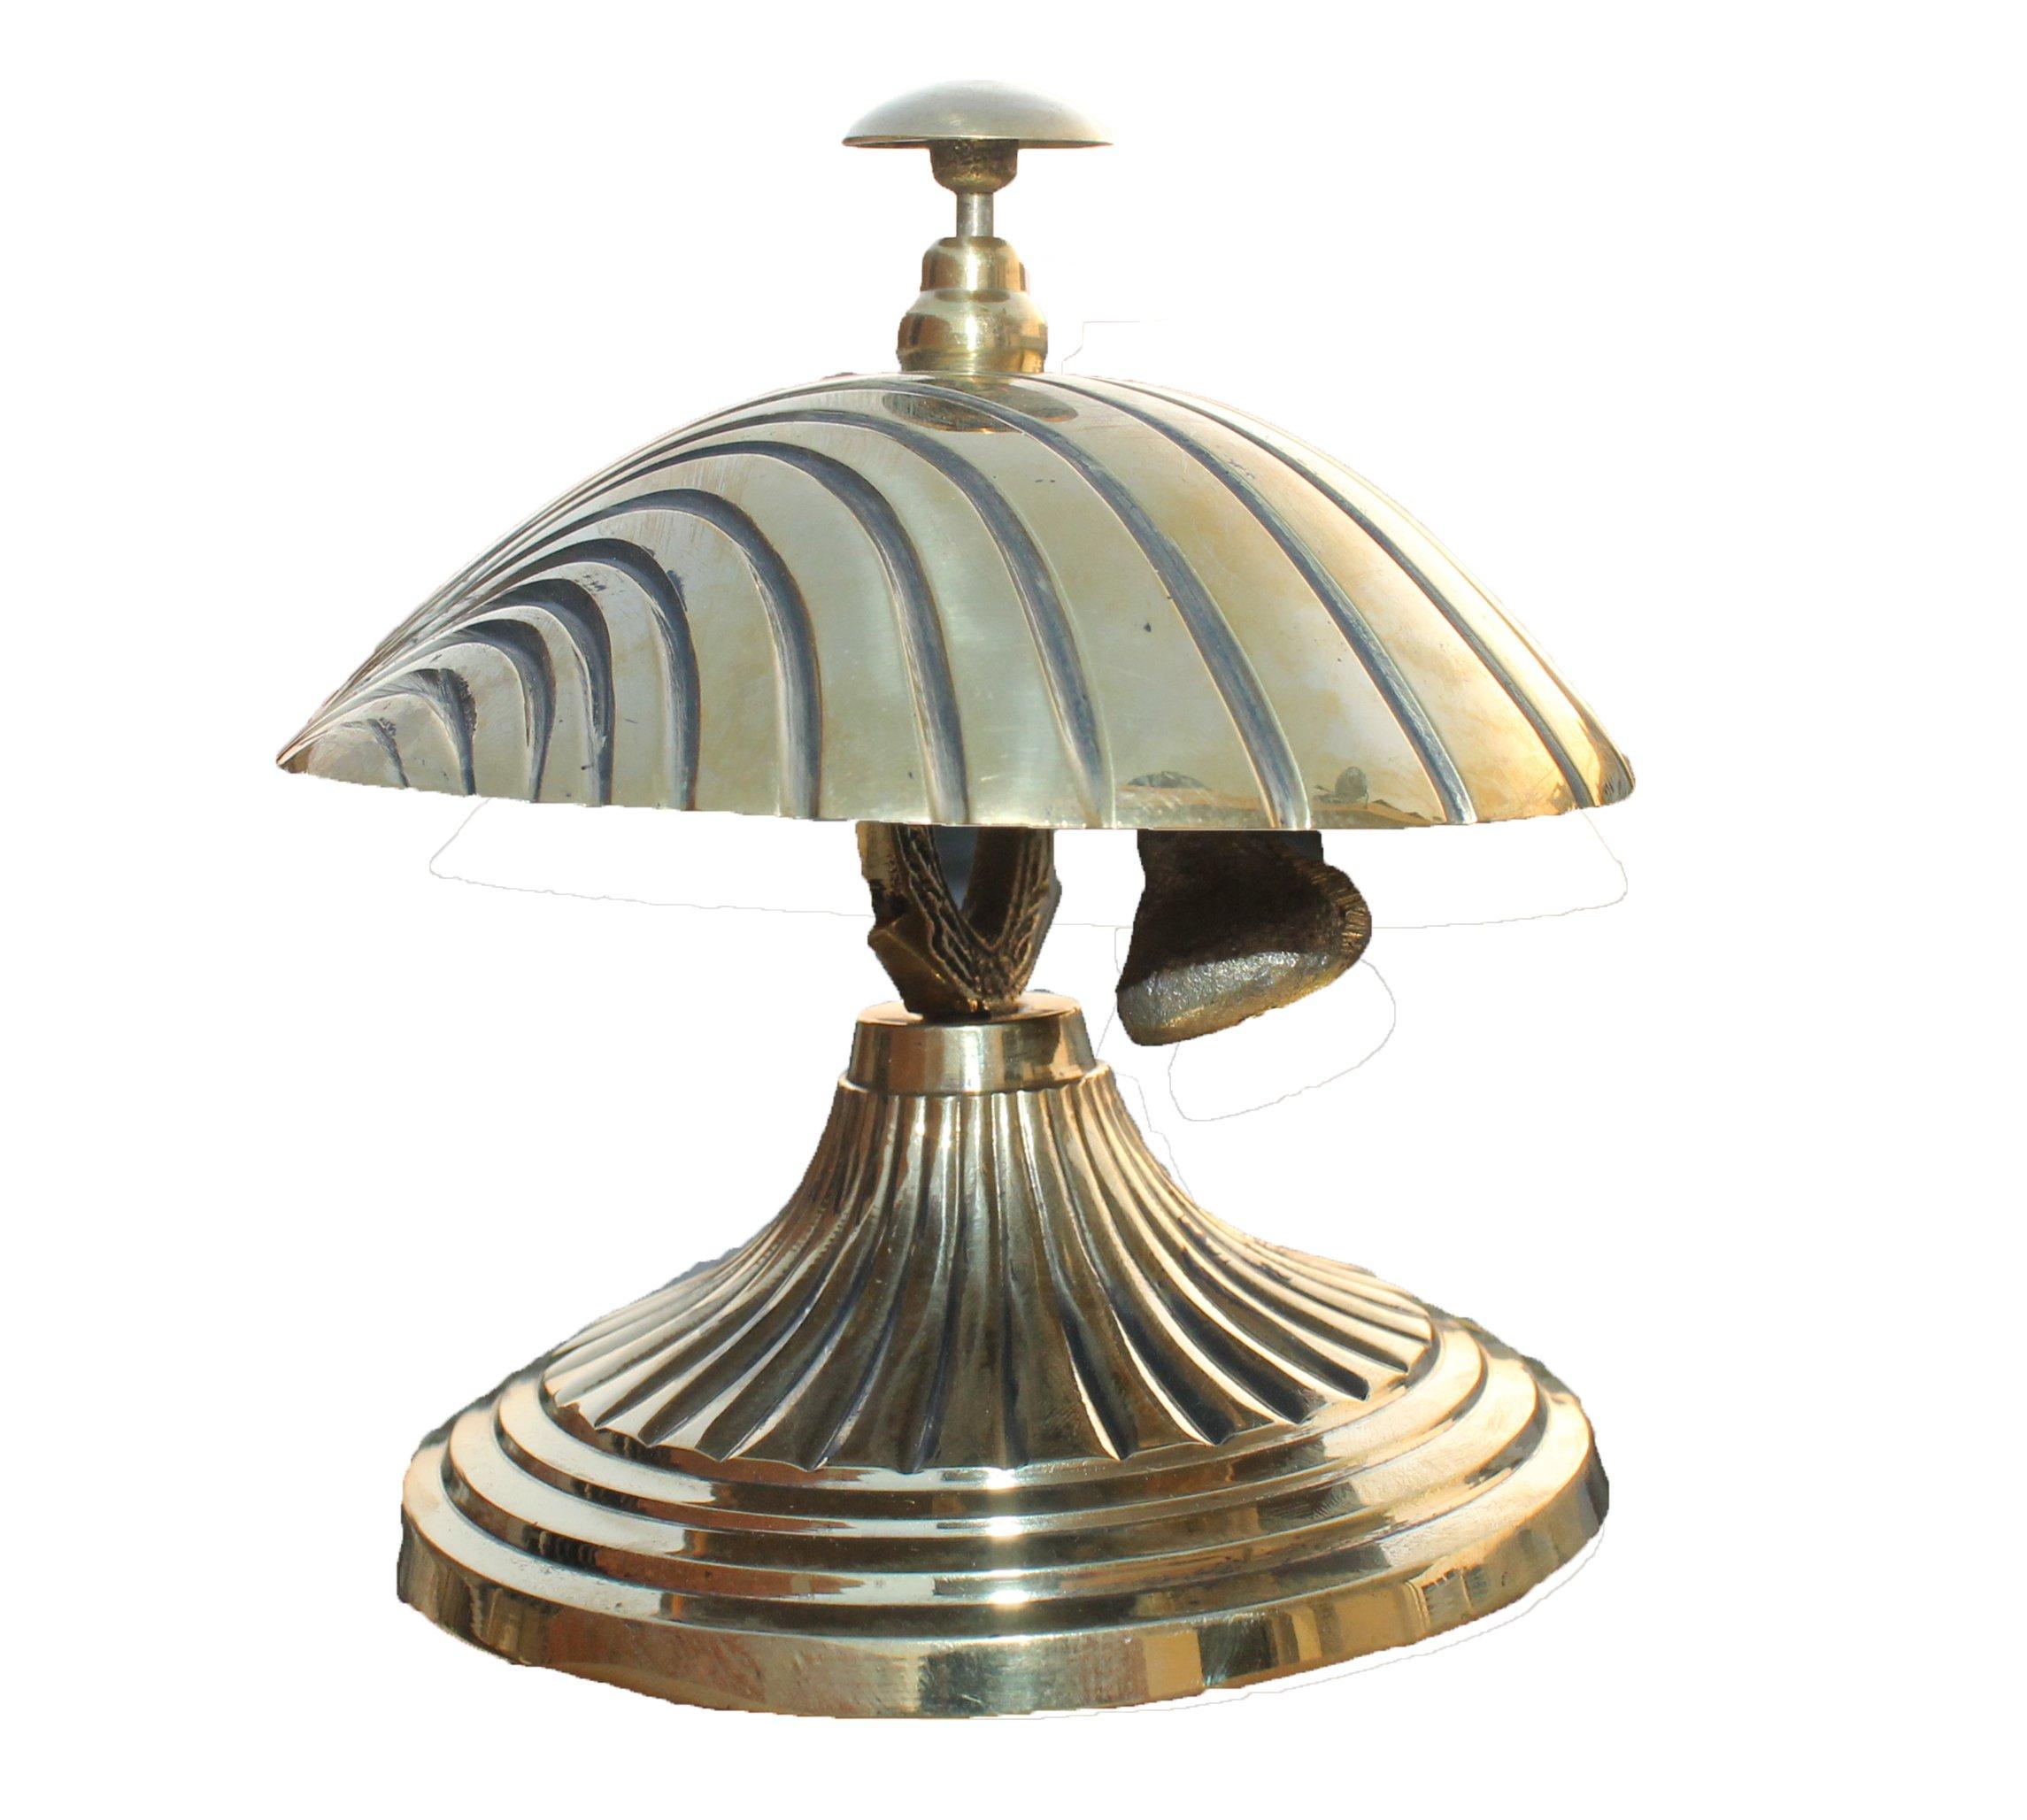 PARIJAT HANDICRAFT Handcrafted Solid Brass Hotel Counter Bell, Officer call bell Ornate Brass Shell Design Bell Desk Bell Service Bell for Hotels, Schools, Restaurants, Reception Areas.